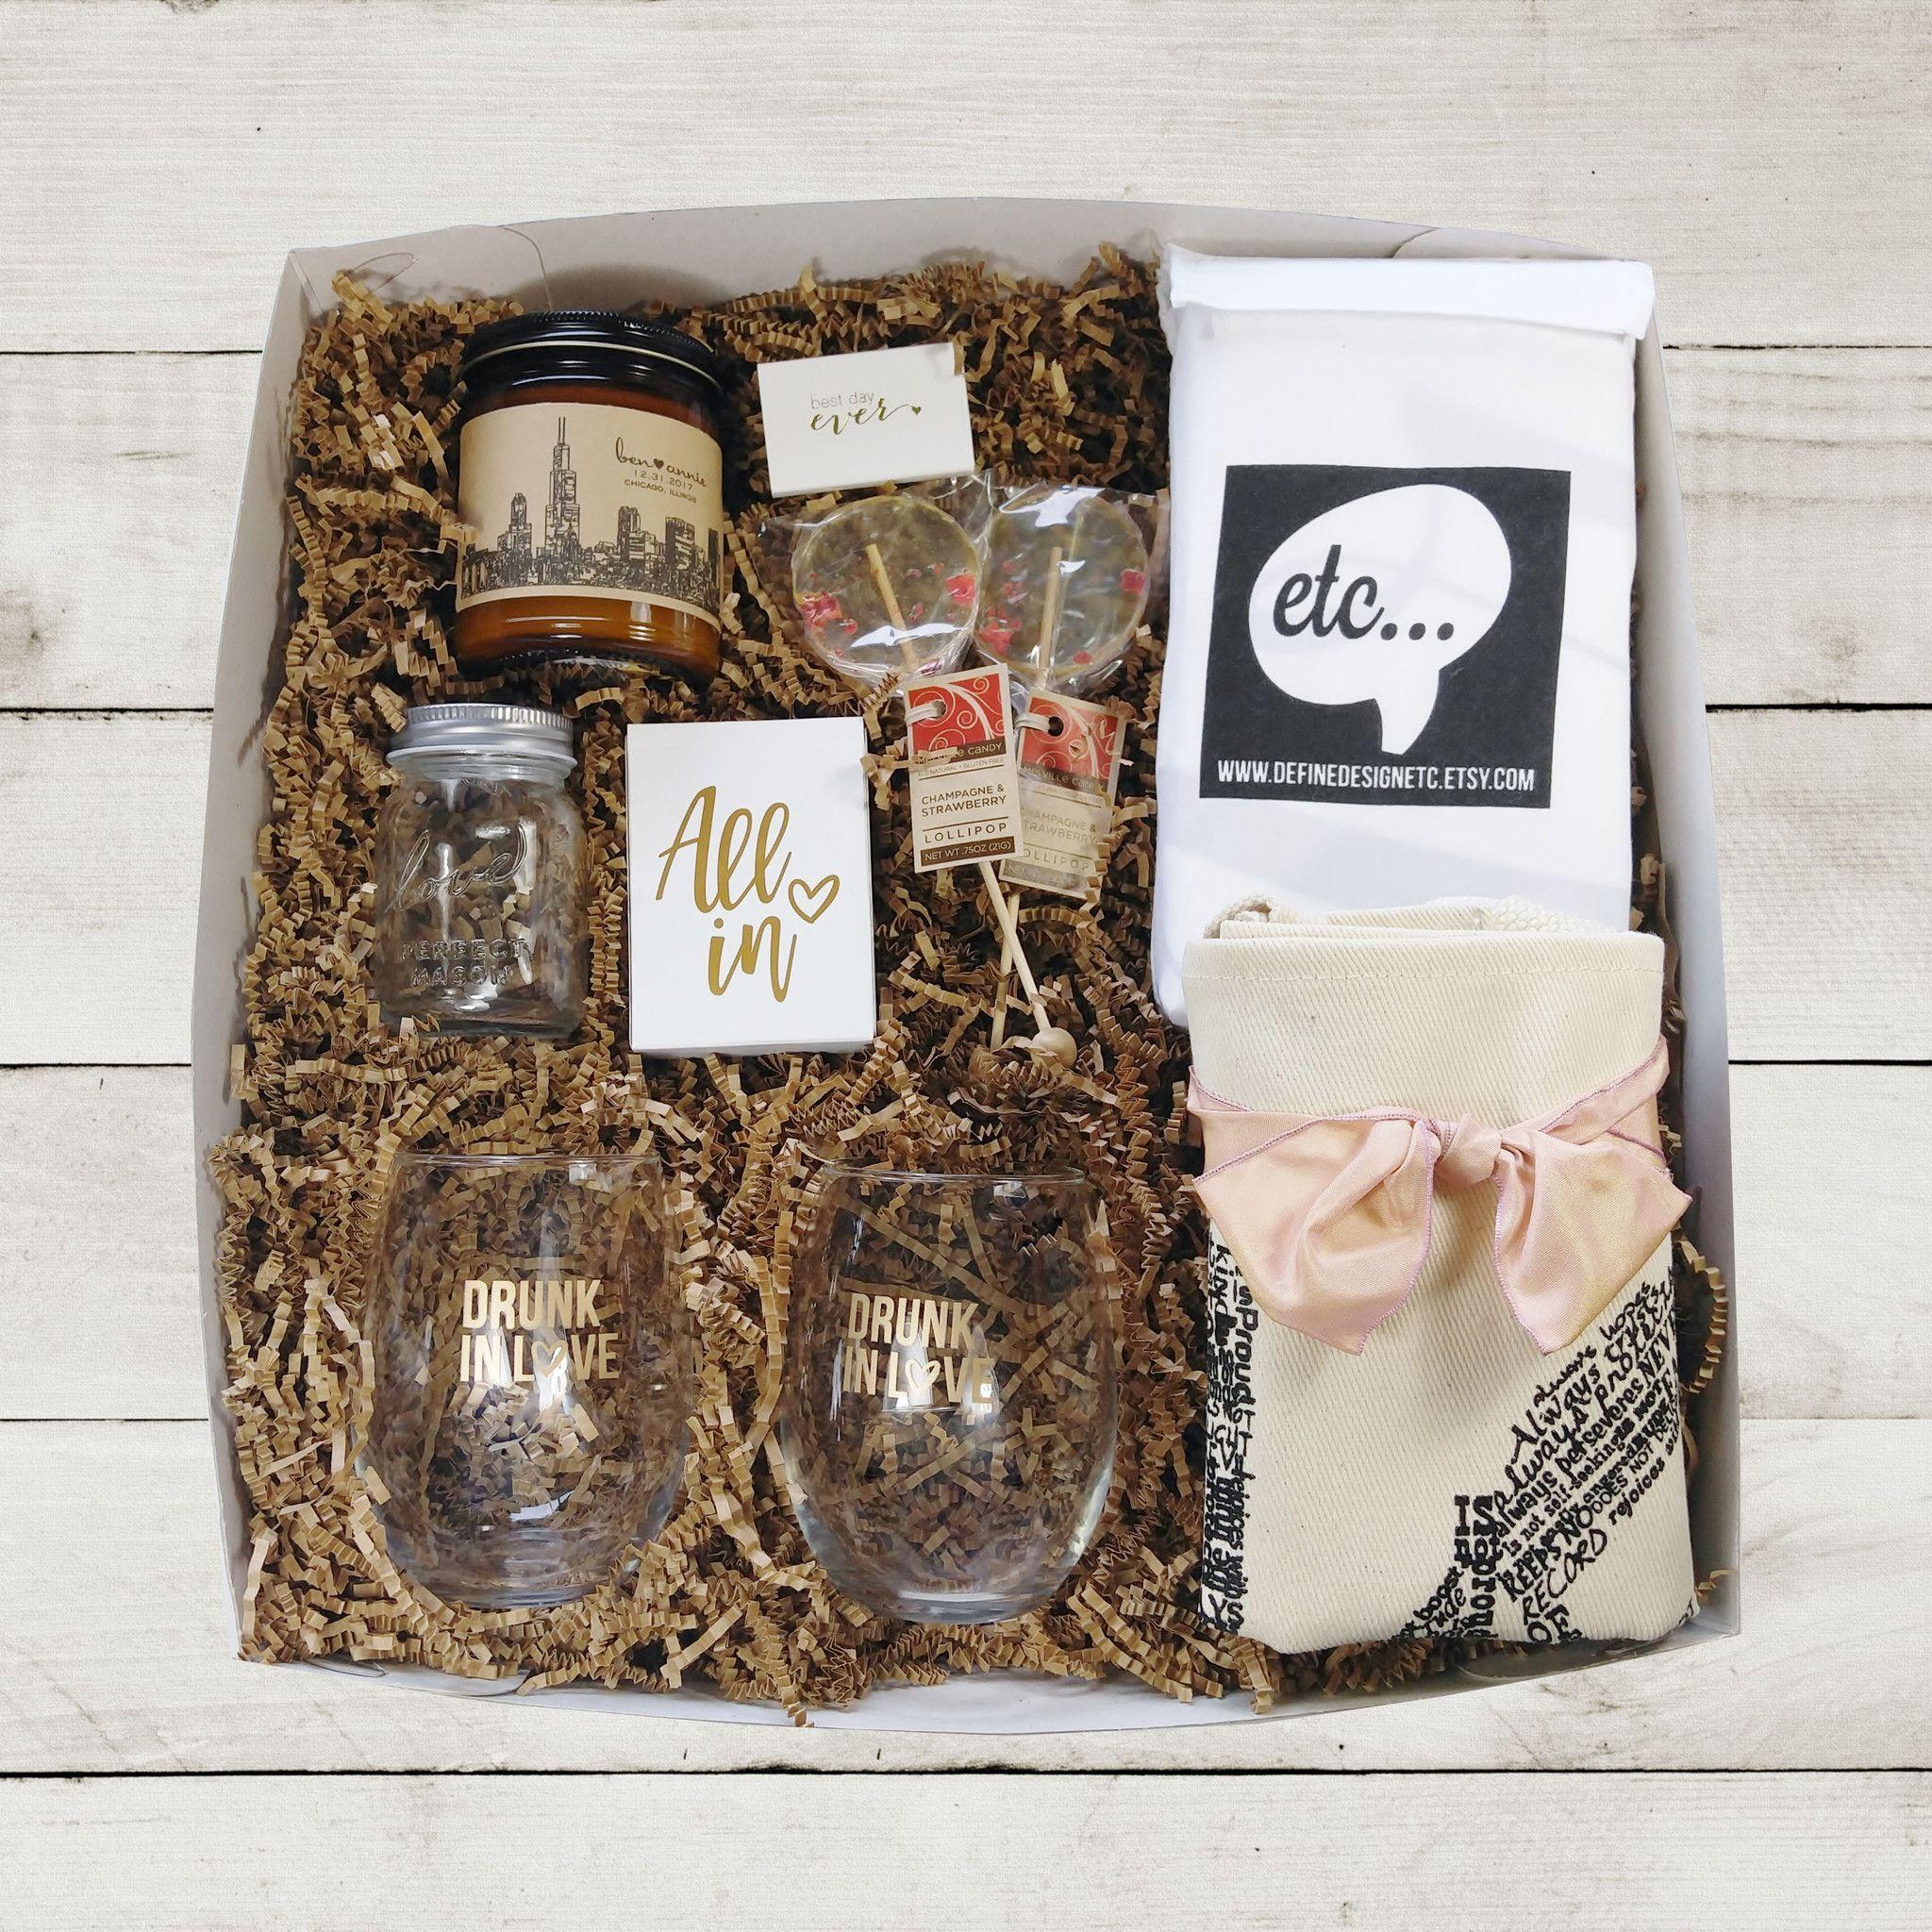 Wedding Gift Set Wedding Gift Box Wedding Package Honeymoon Gift Package Bride Gift Bridal Shower Wedding Gift Boxes Wedding Gift Set Gifts